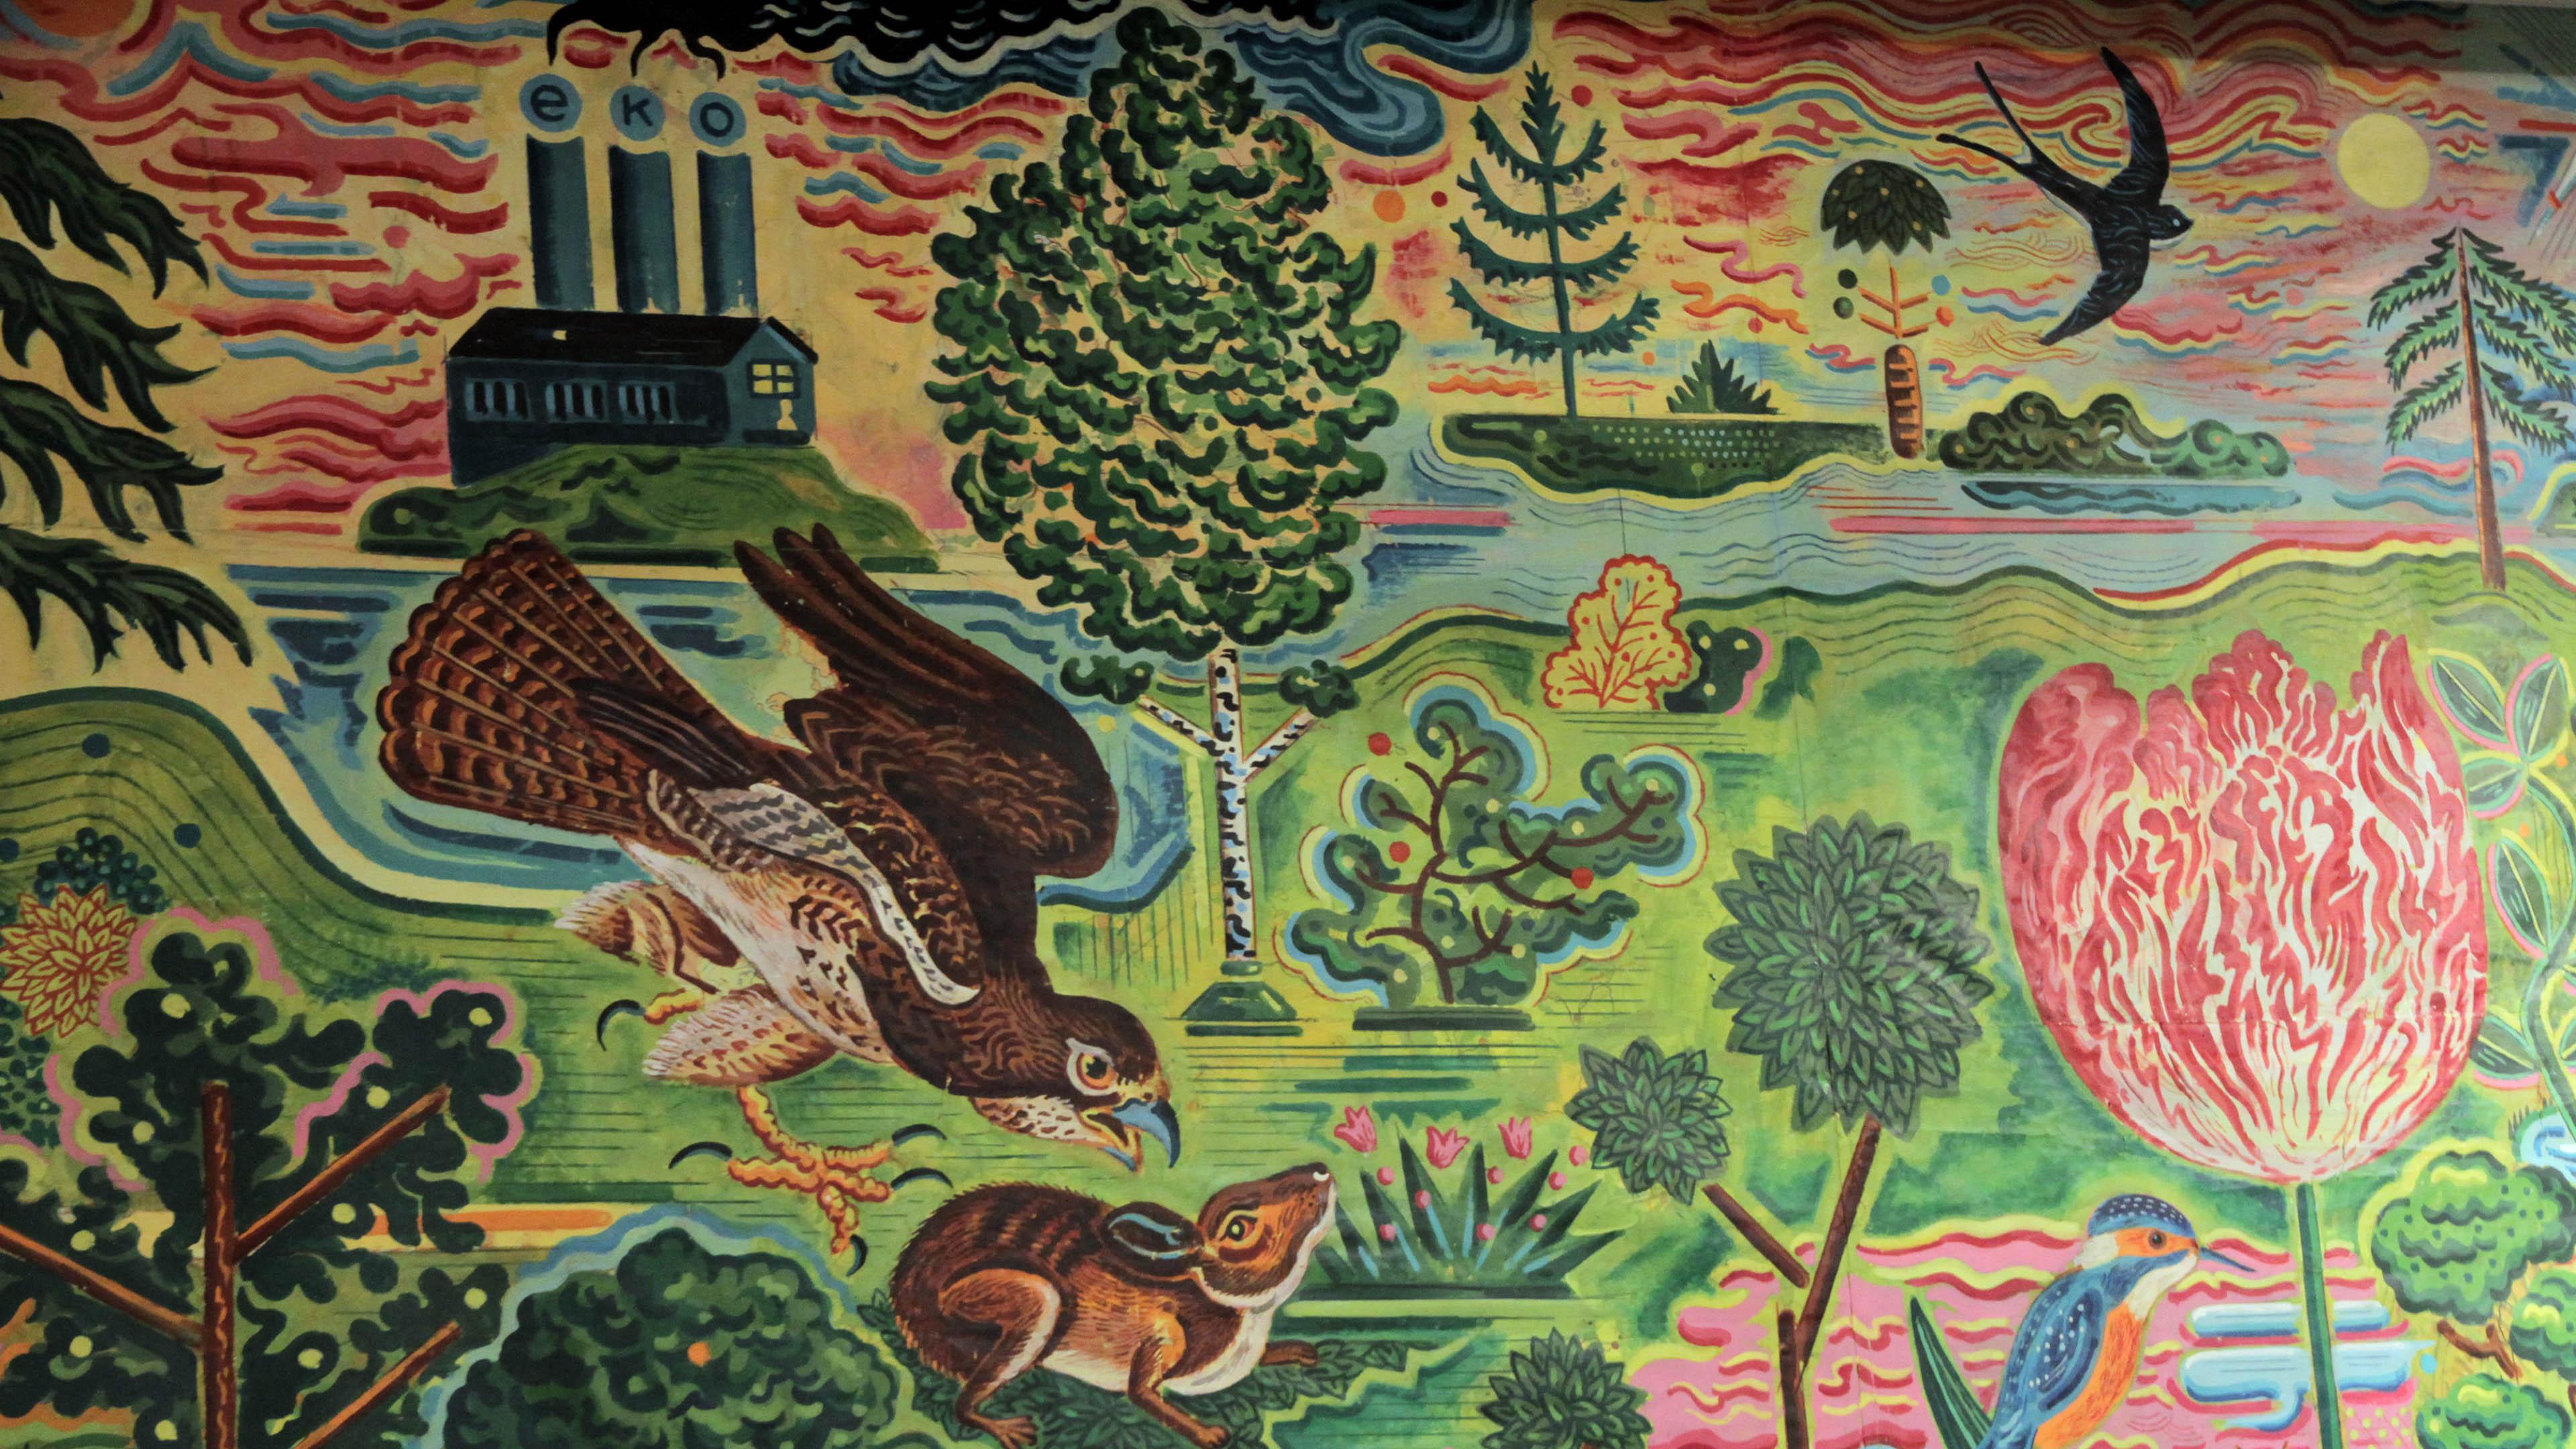 Wandbild von Georg Barber alias Atak